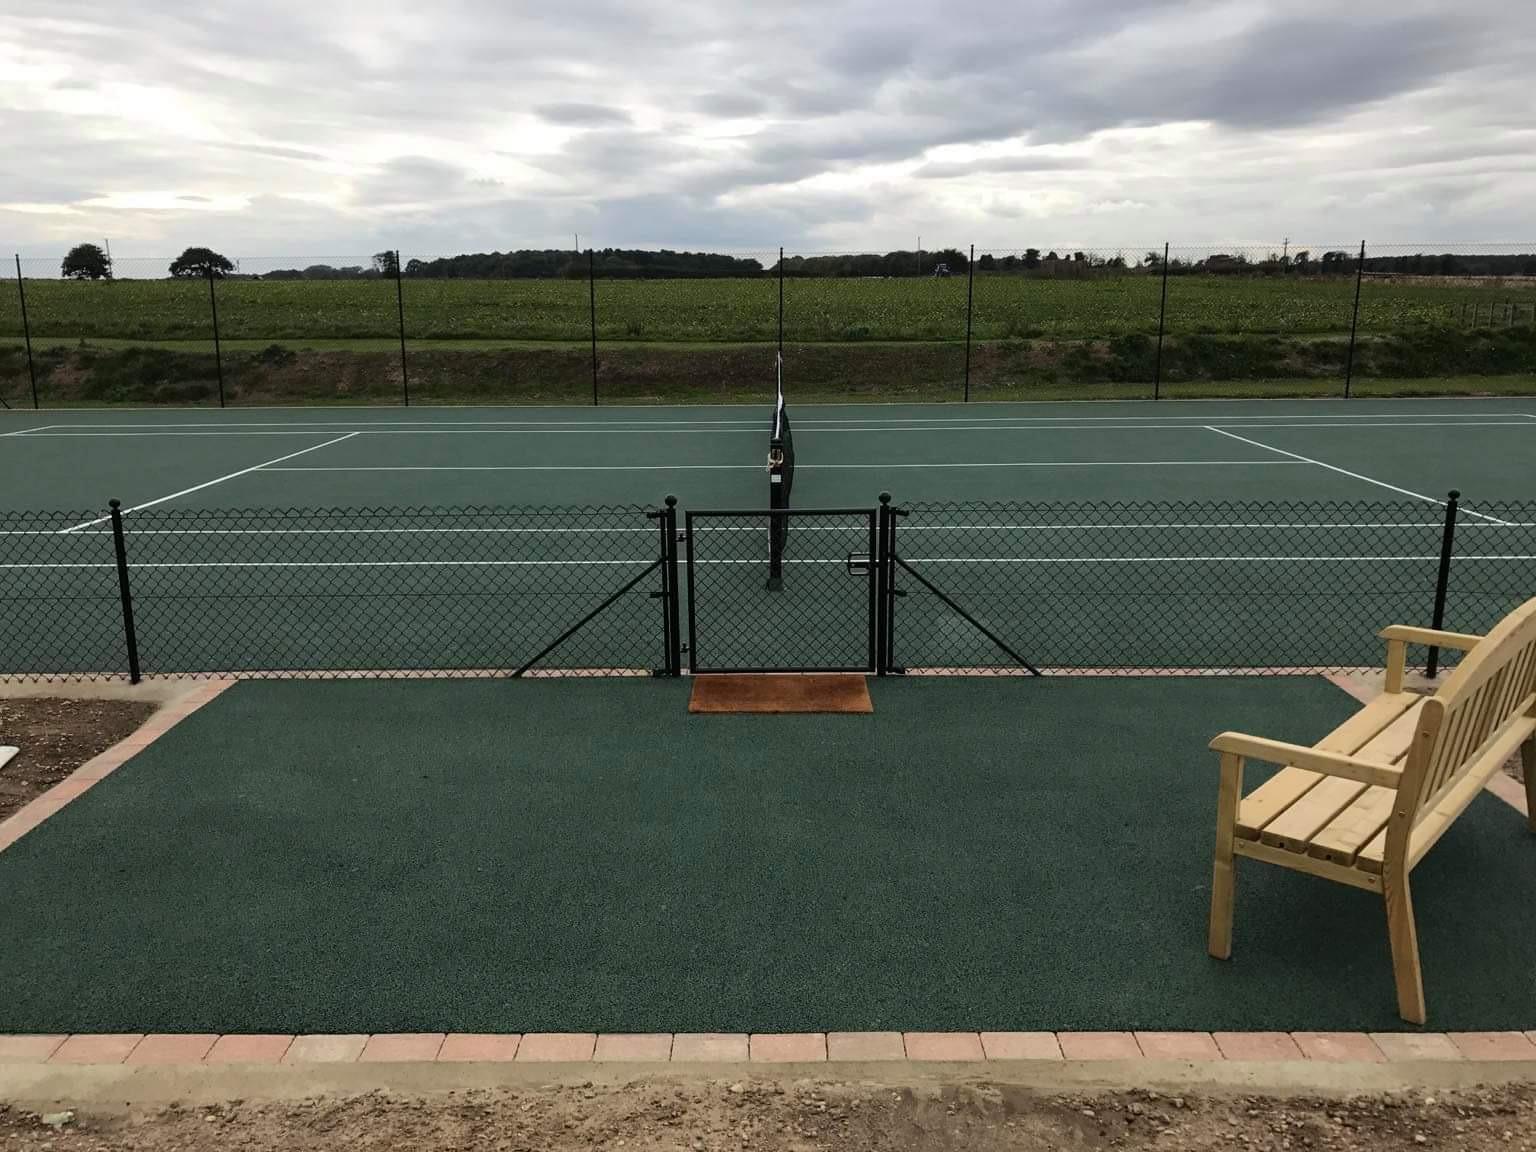 New Court 3